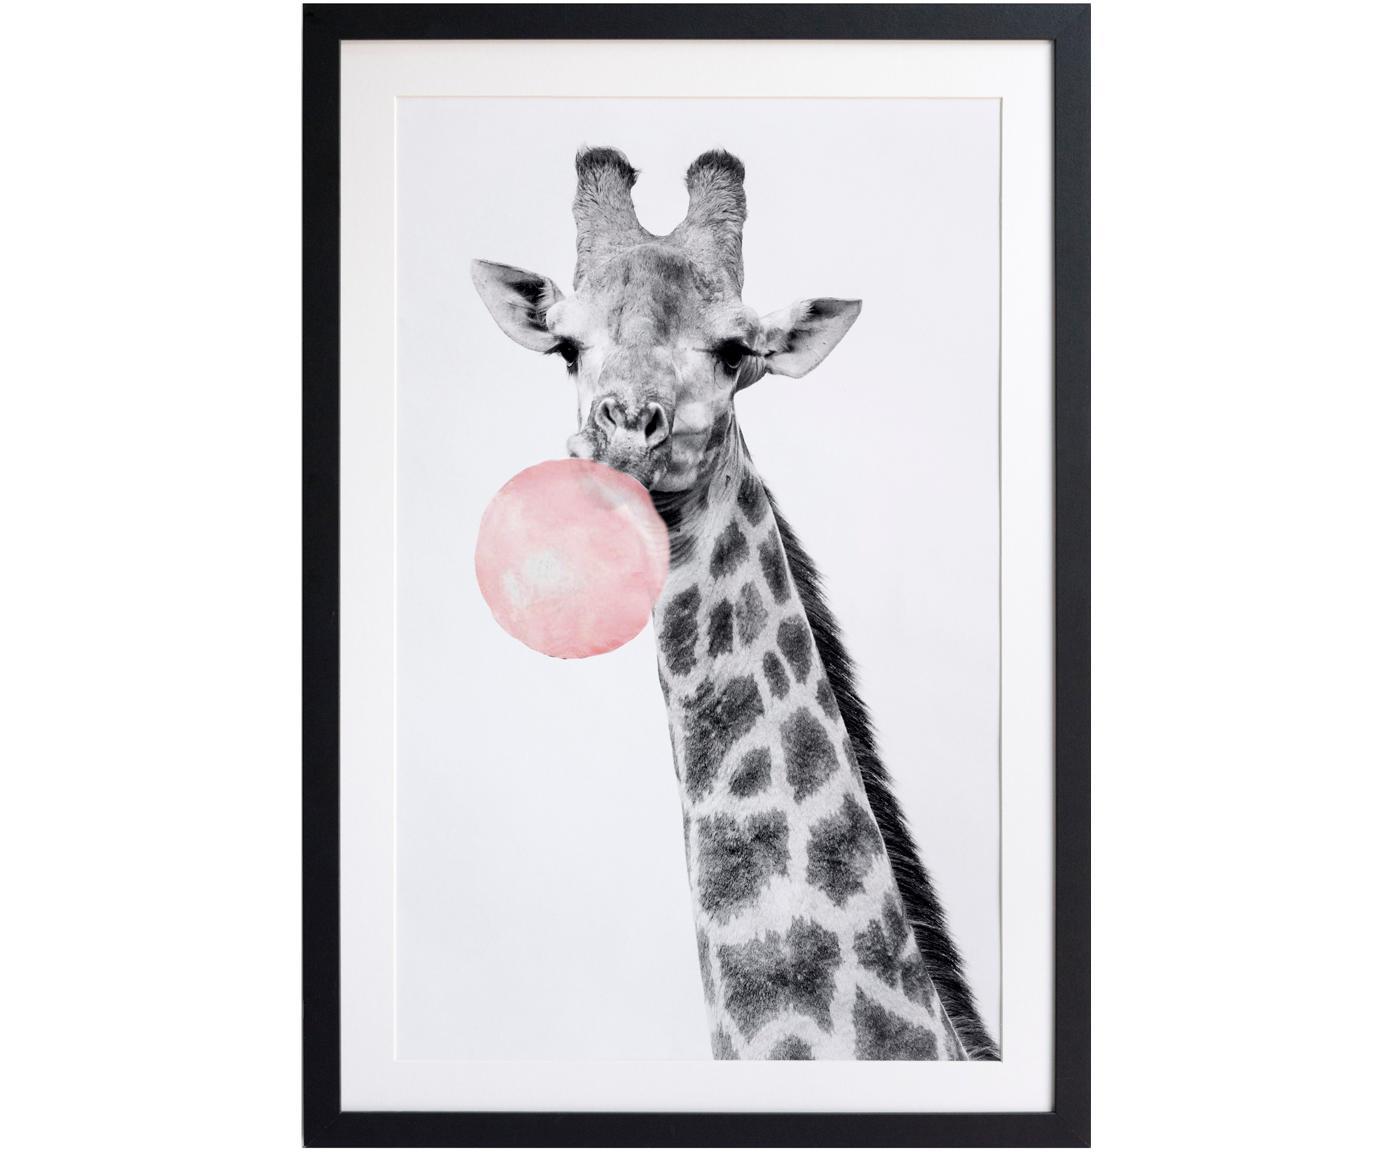 Impresión digital enmarcada Giraffe, Fotografía: impresión digital sobre p, Negro, blanco, rosa, An 40 x Al 60 cm